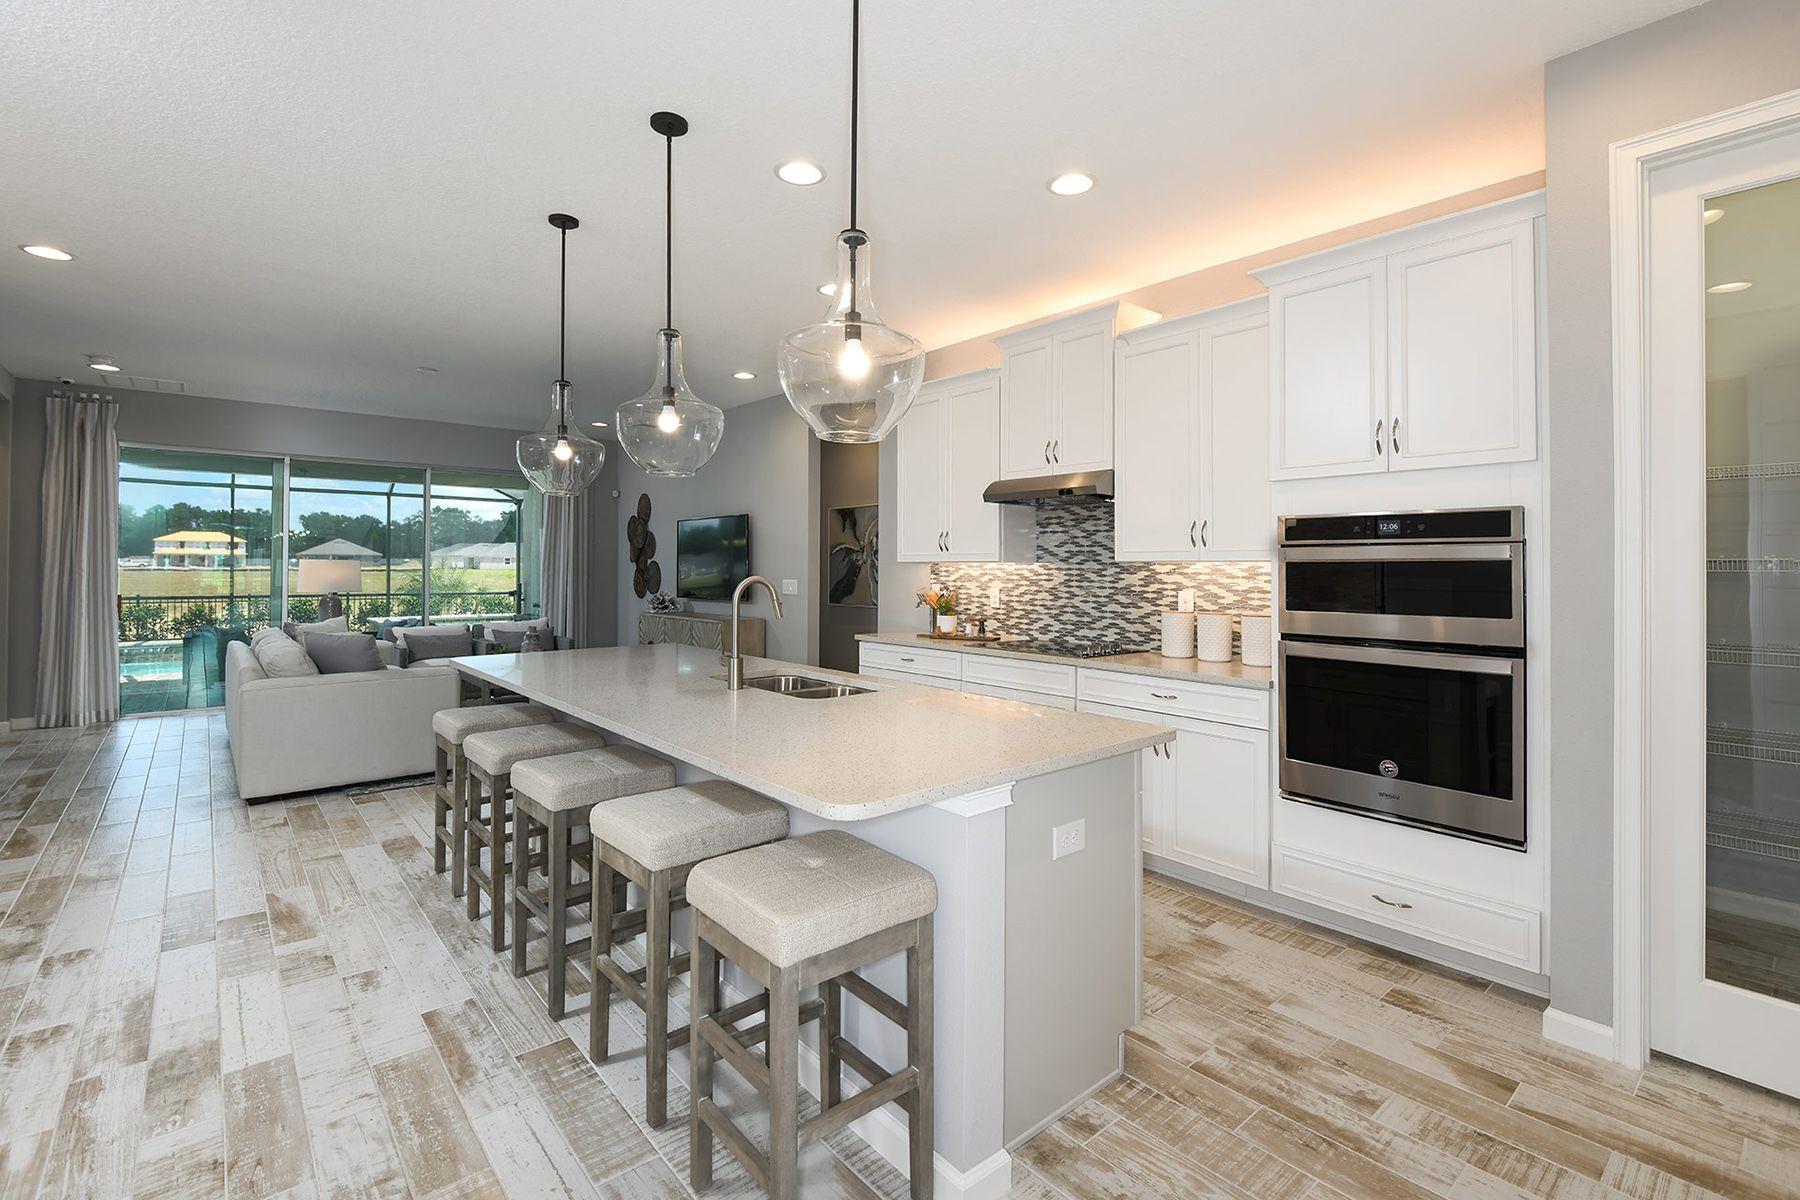 Kitchen featured in the Serenity By Mattamy Homes in Sarasota-Bradenton, FL